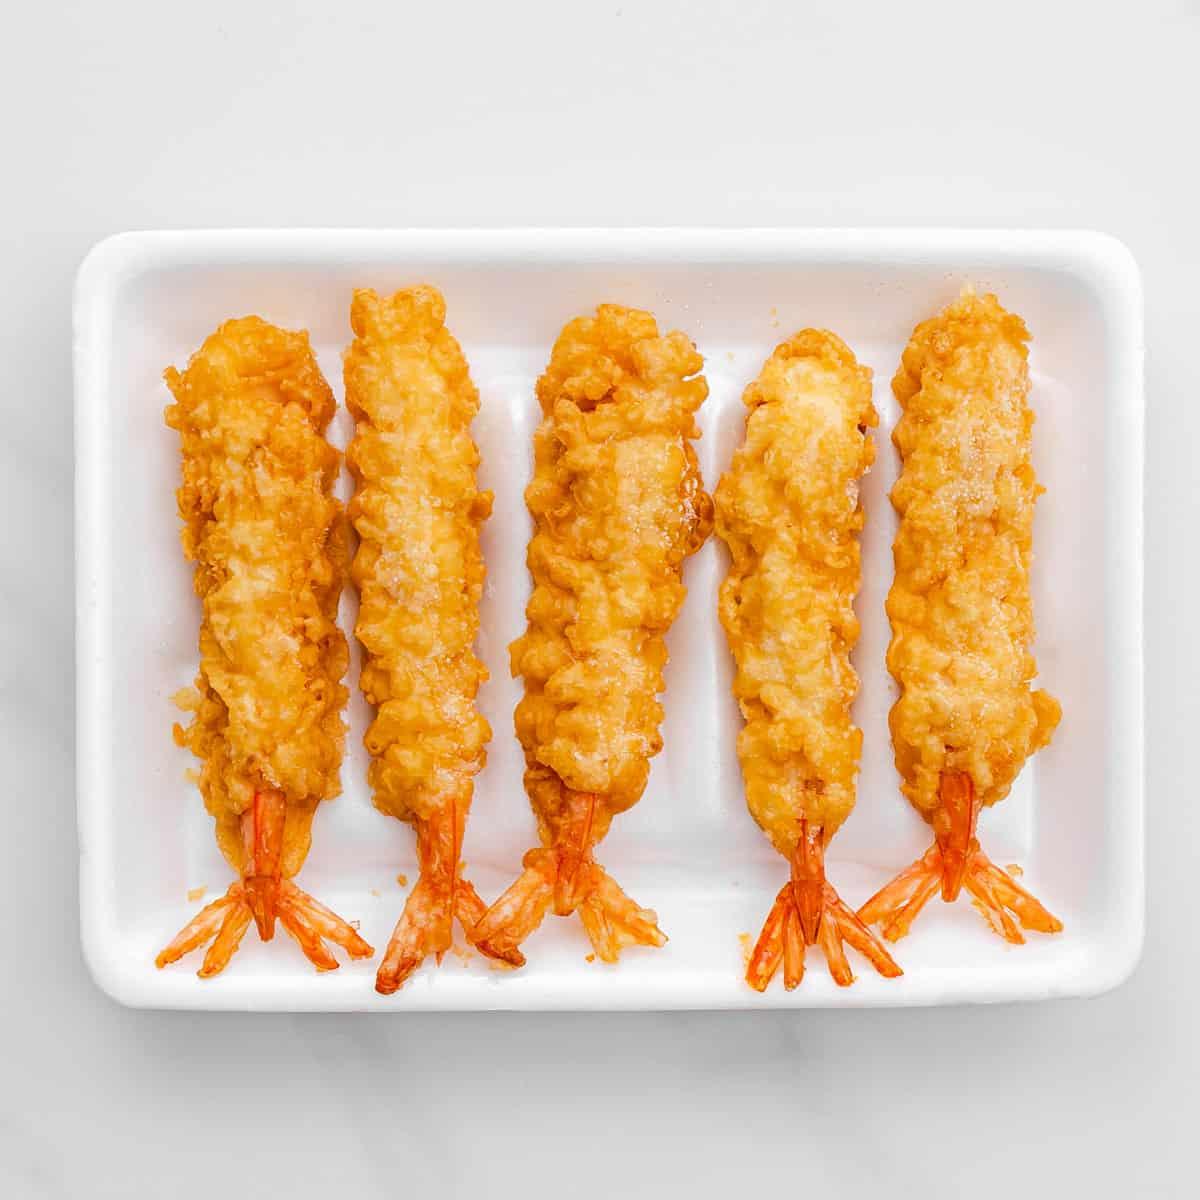 Costco Tempura Shrimp.